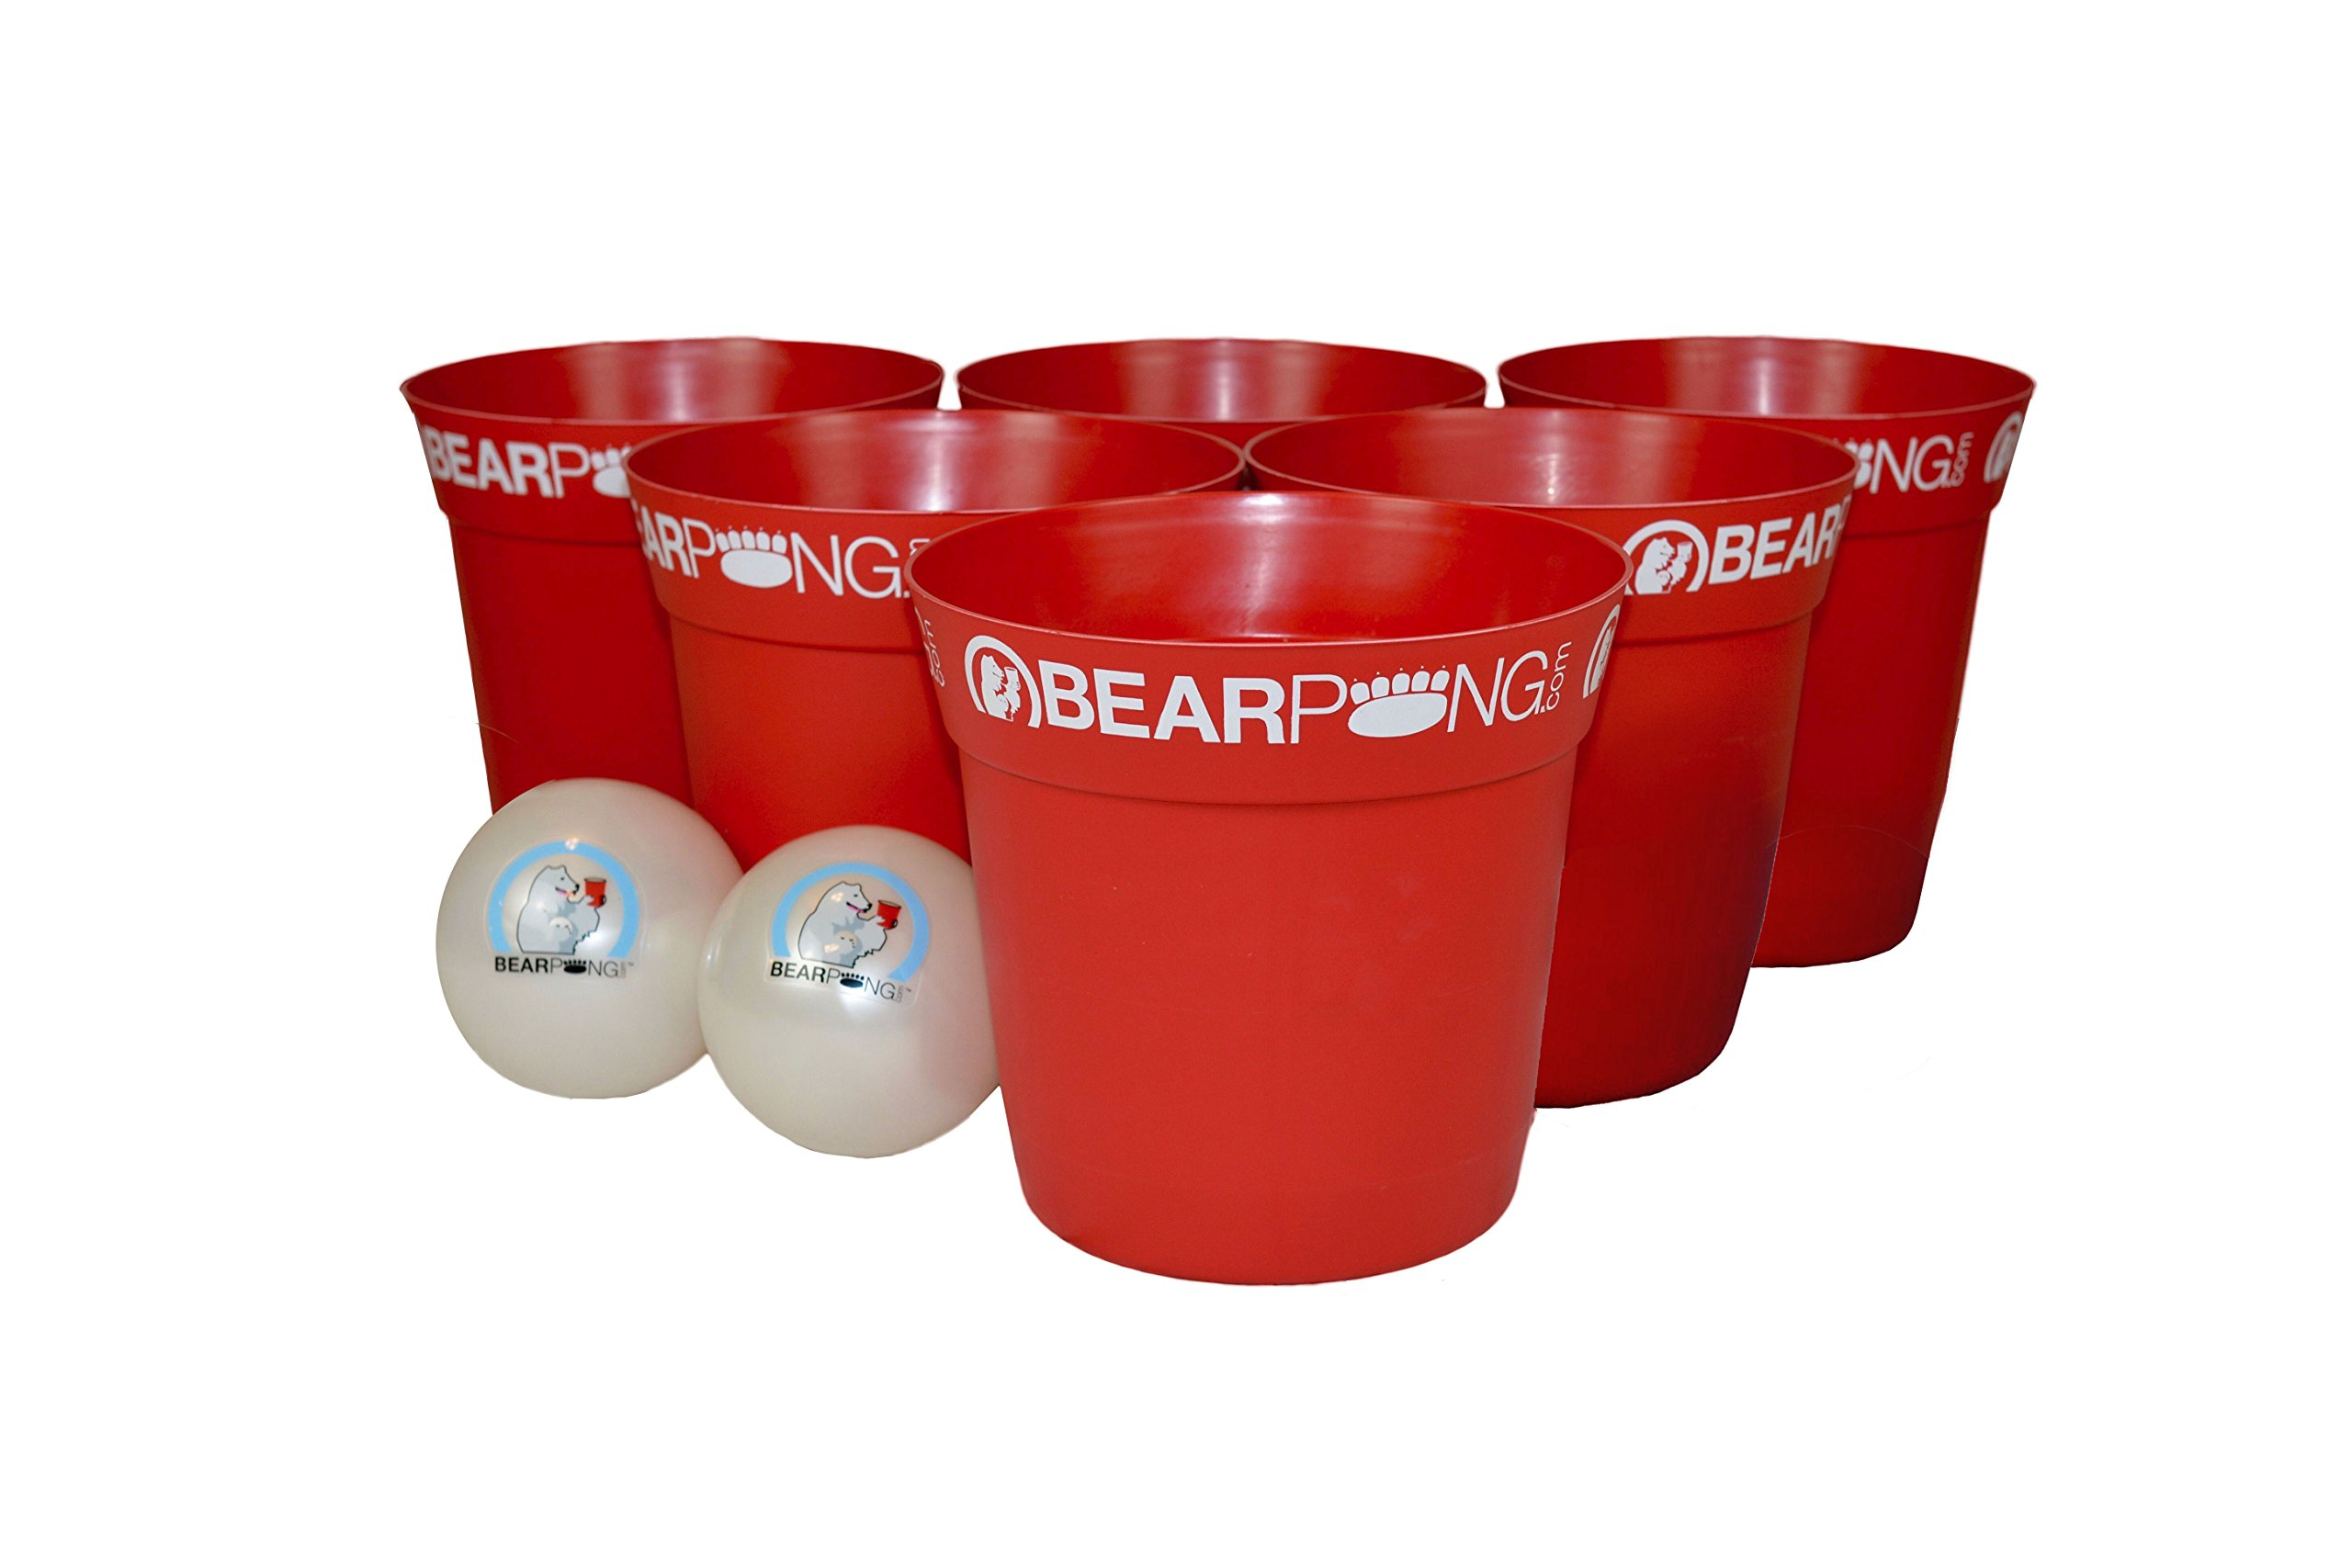 Bearpong Bearpong Game Set: 12 BEARPONG Buckets, 2 BEARPONG Balls with Carrying Case, and Instruction (Red) by Bear Pong